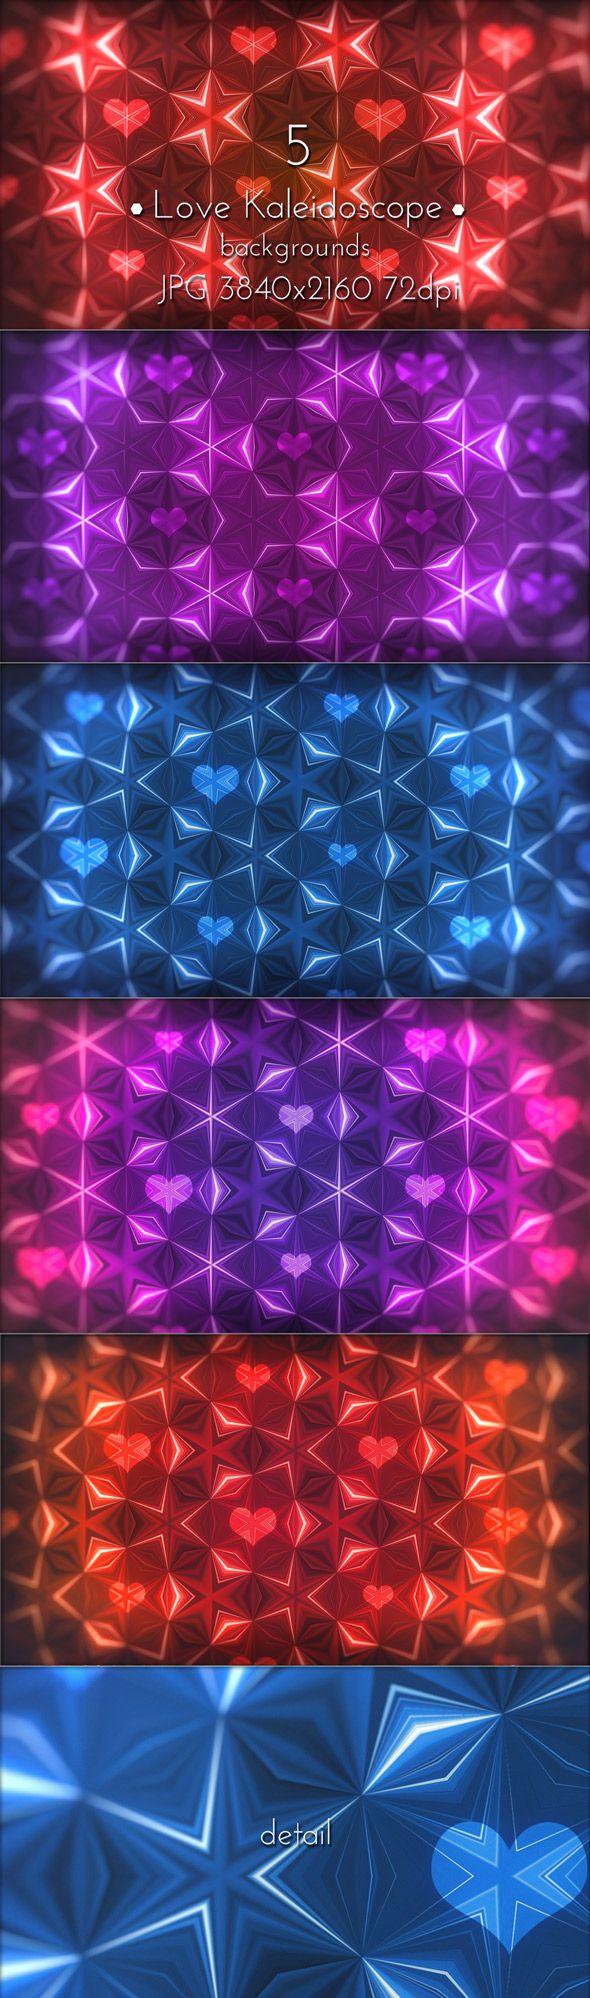 Love Kaleidoscope Patterns UltraHD backgrounds. #love #kaleidoscope #patterns #valentines #backdrops